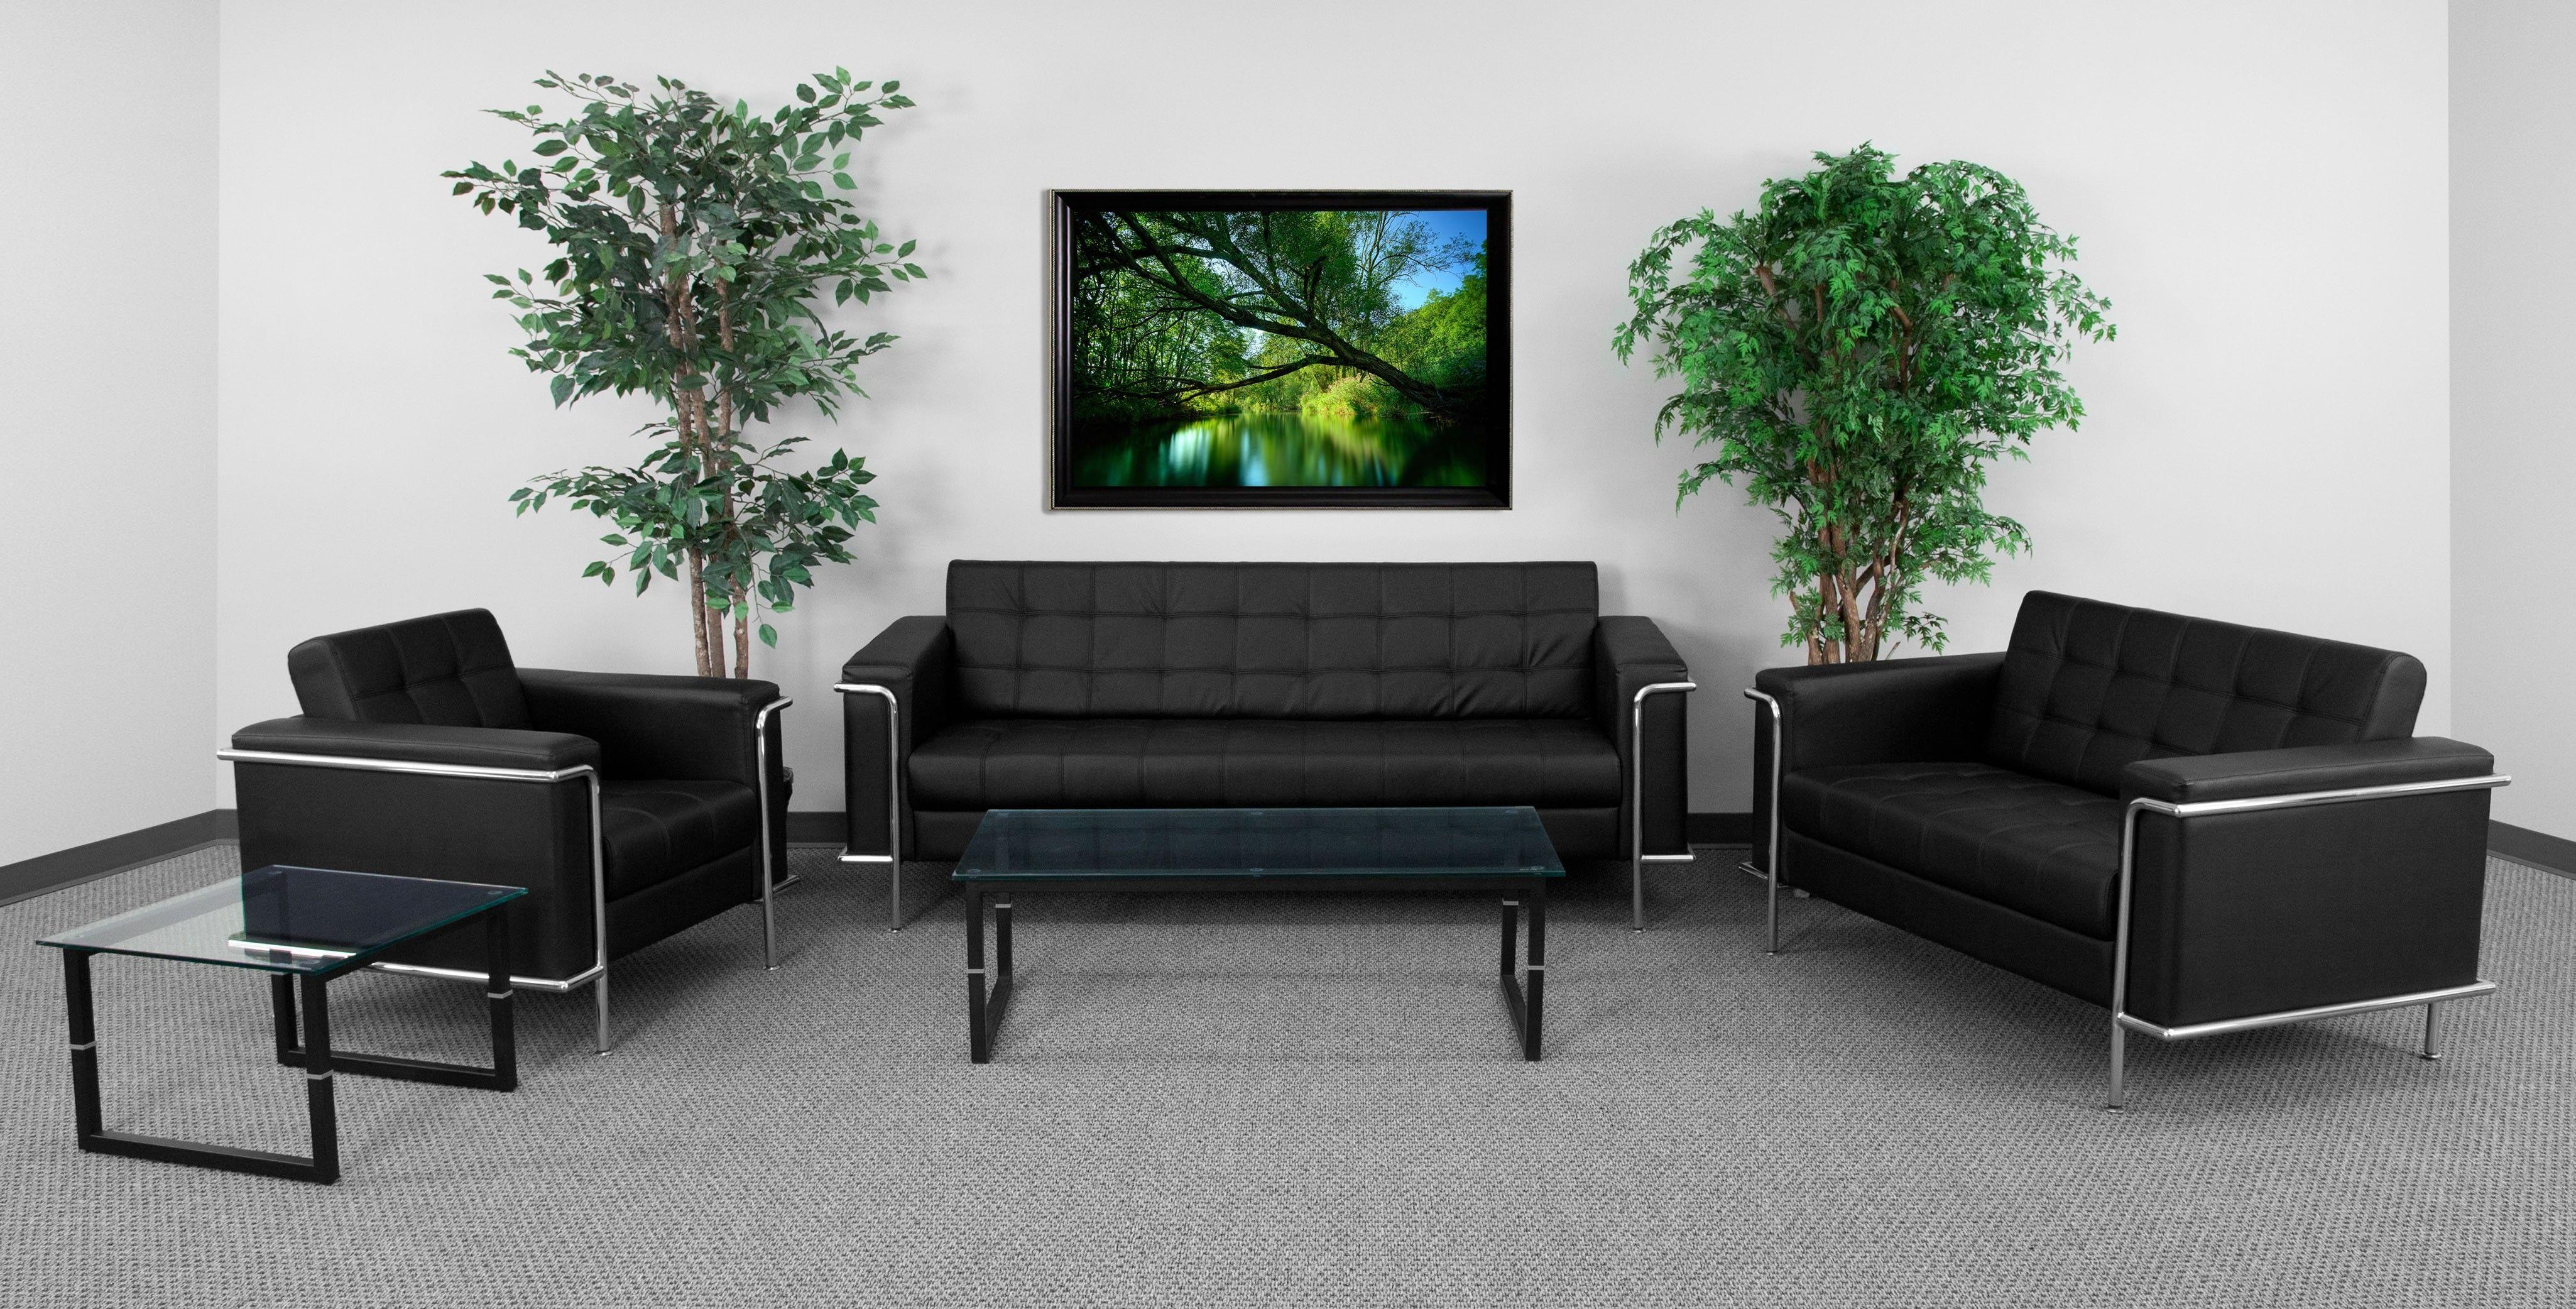 Office Furniture Waiting Room Chairs Minimalist Design On ...